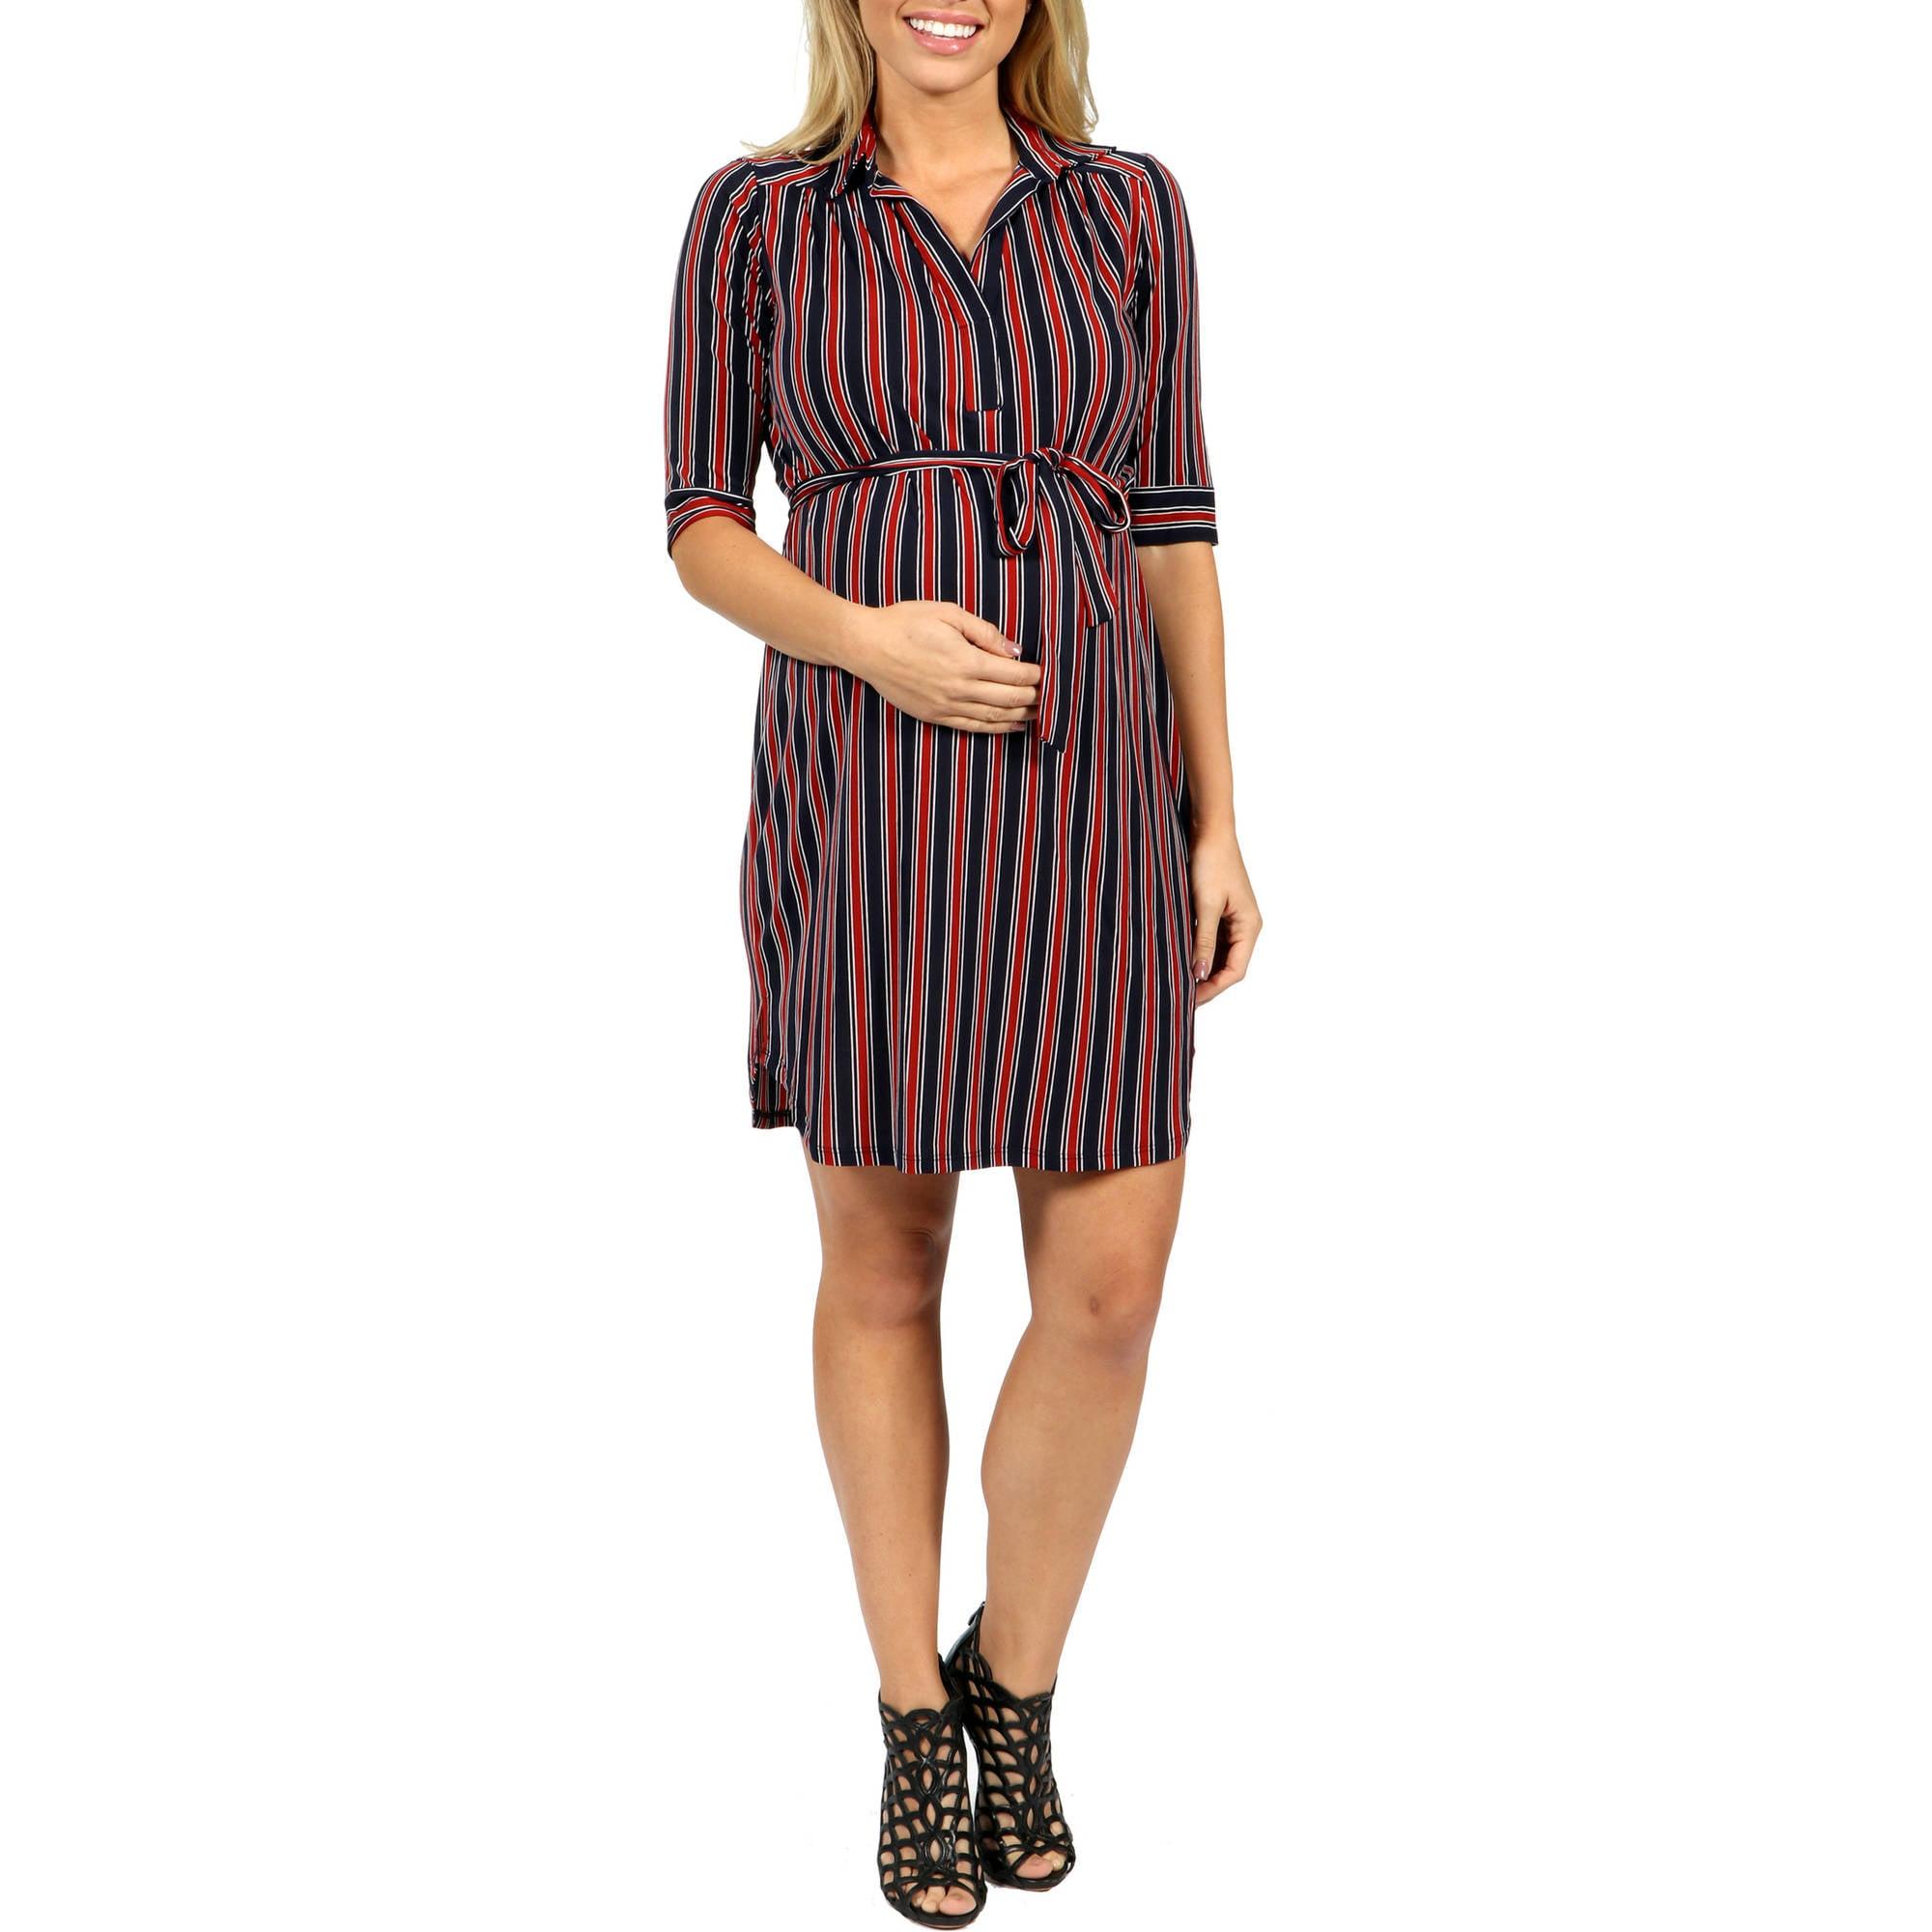 24/7 Comfort Apparel Paris Stripe Maternity Dress